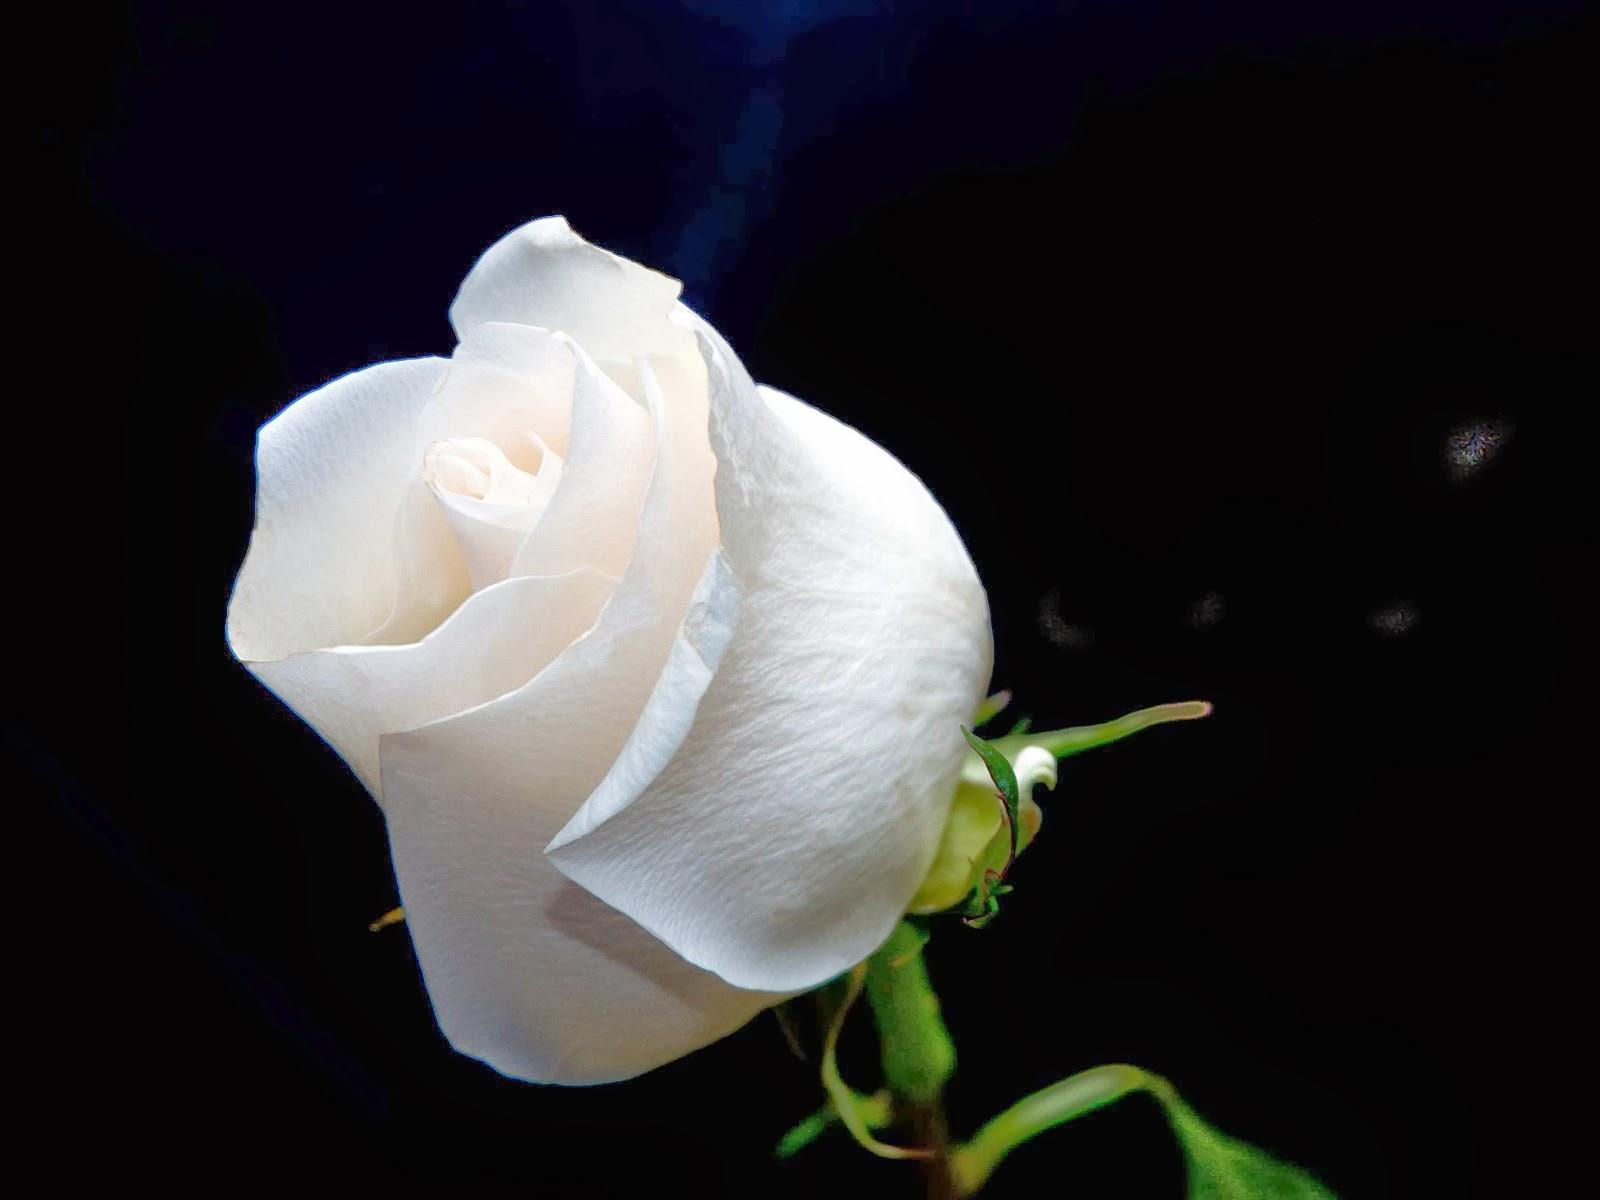 White Roses Wallpapers Keywords Here